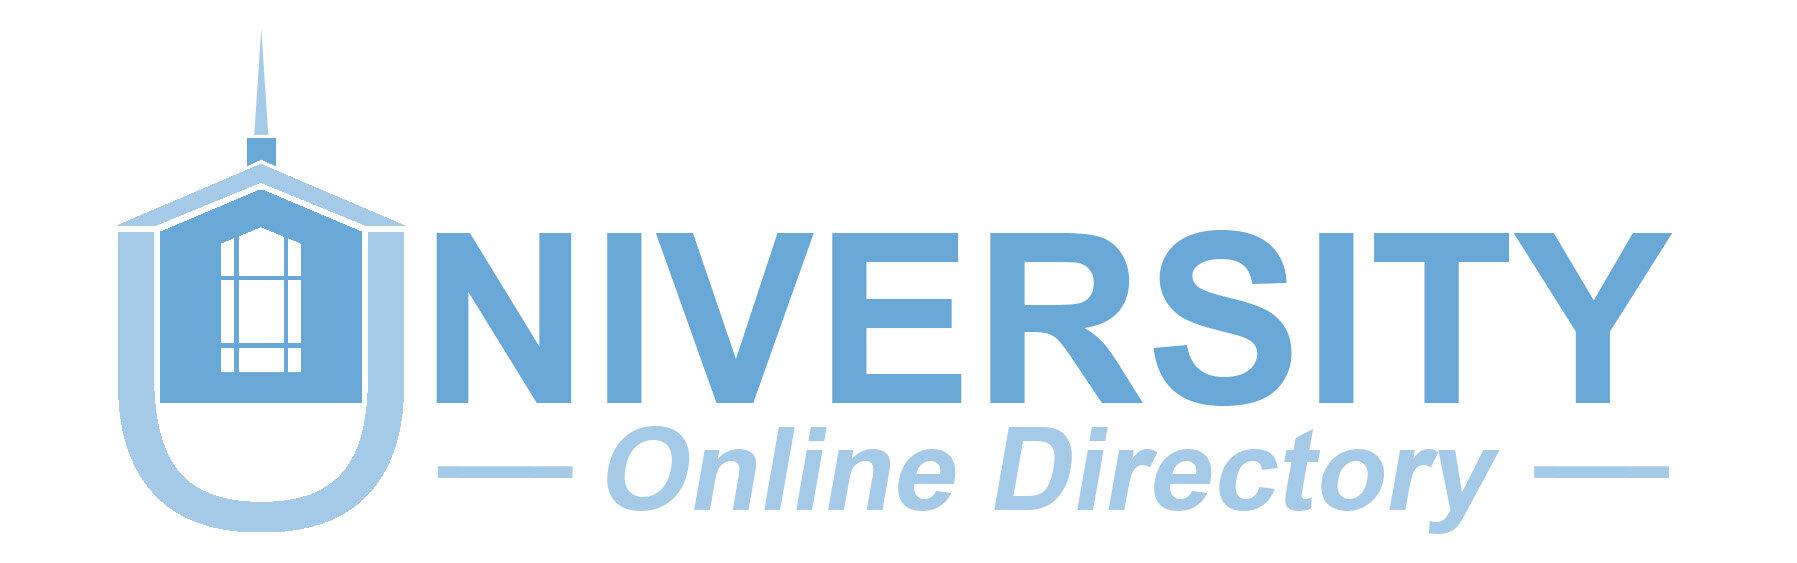 online directory.jpg